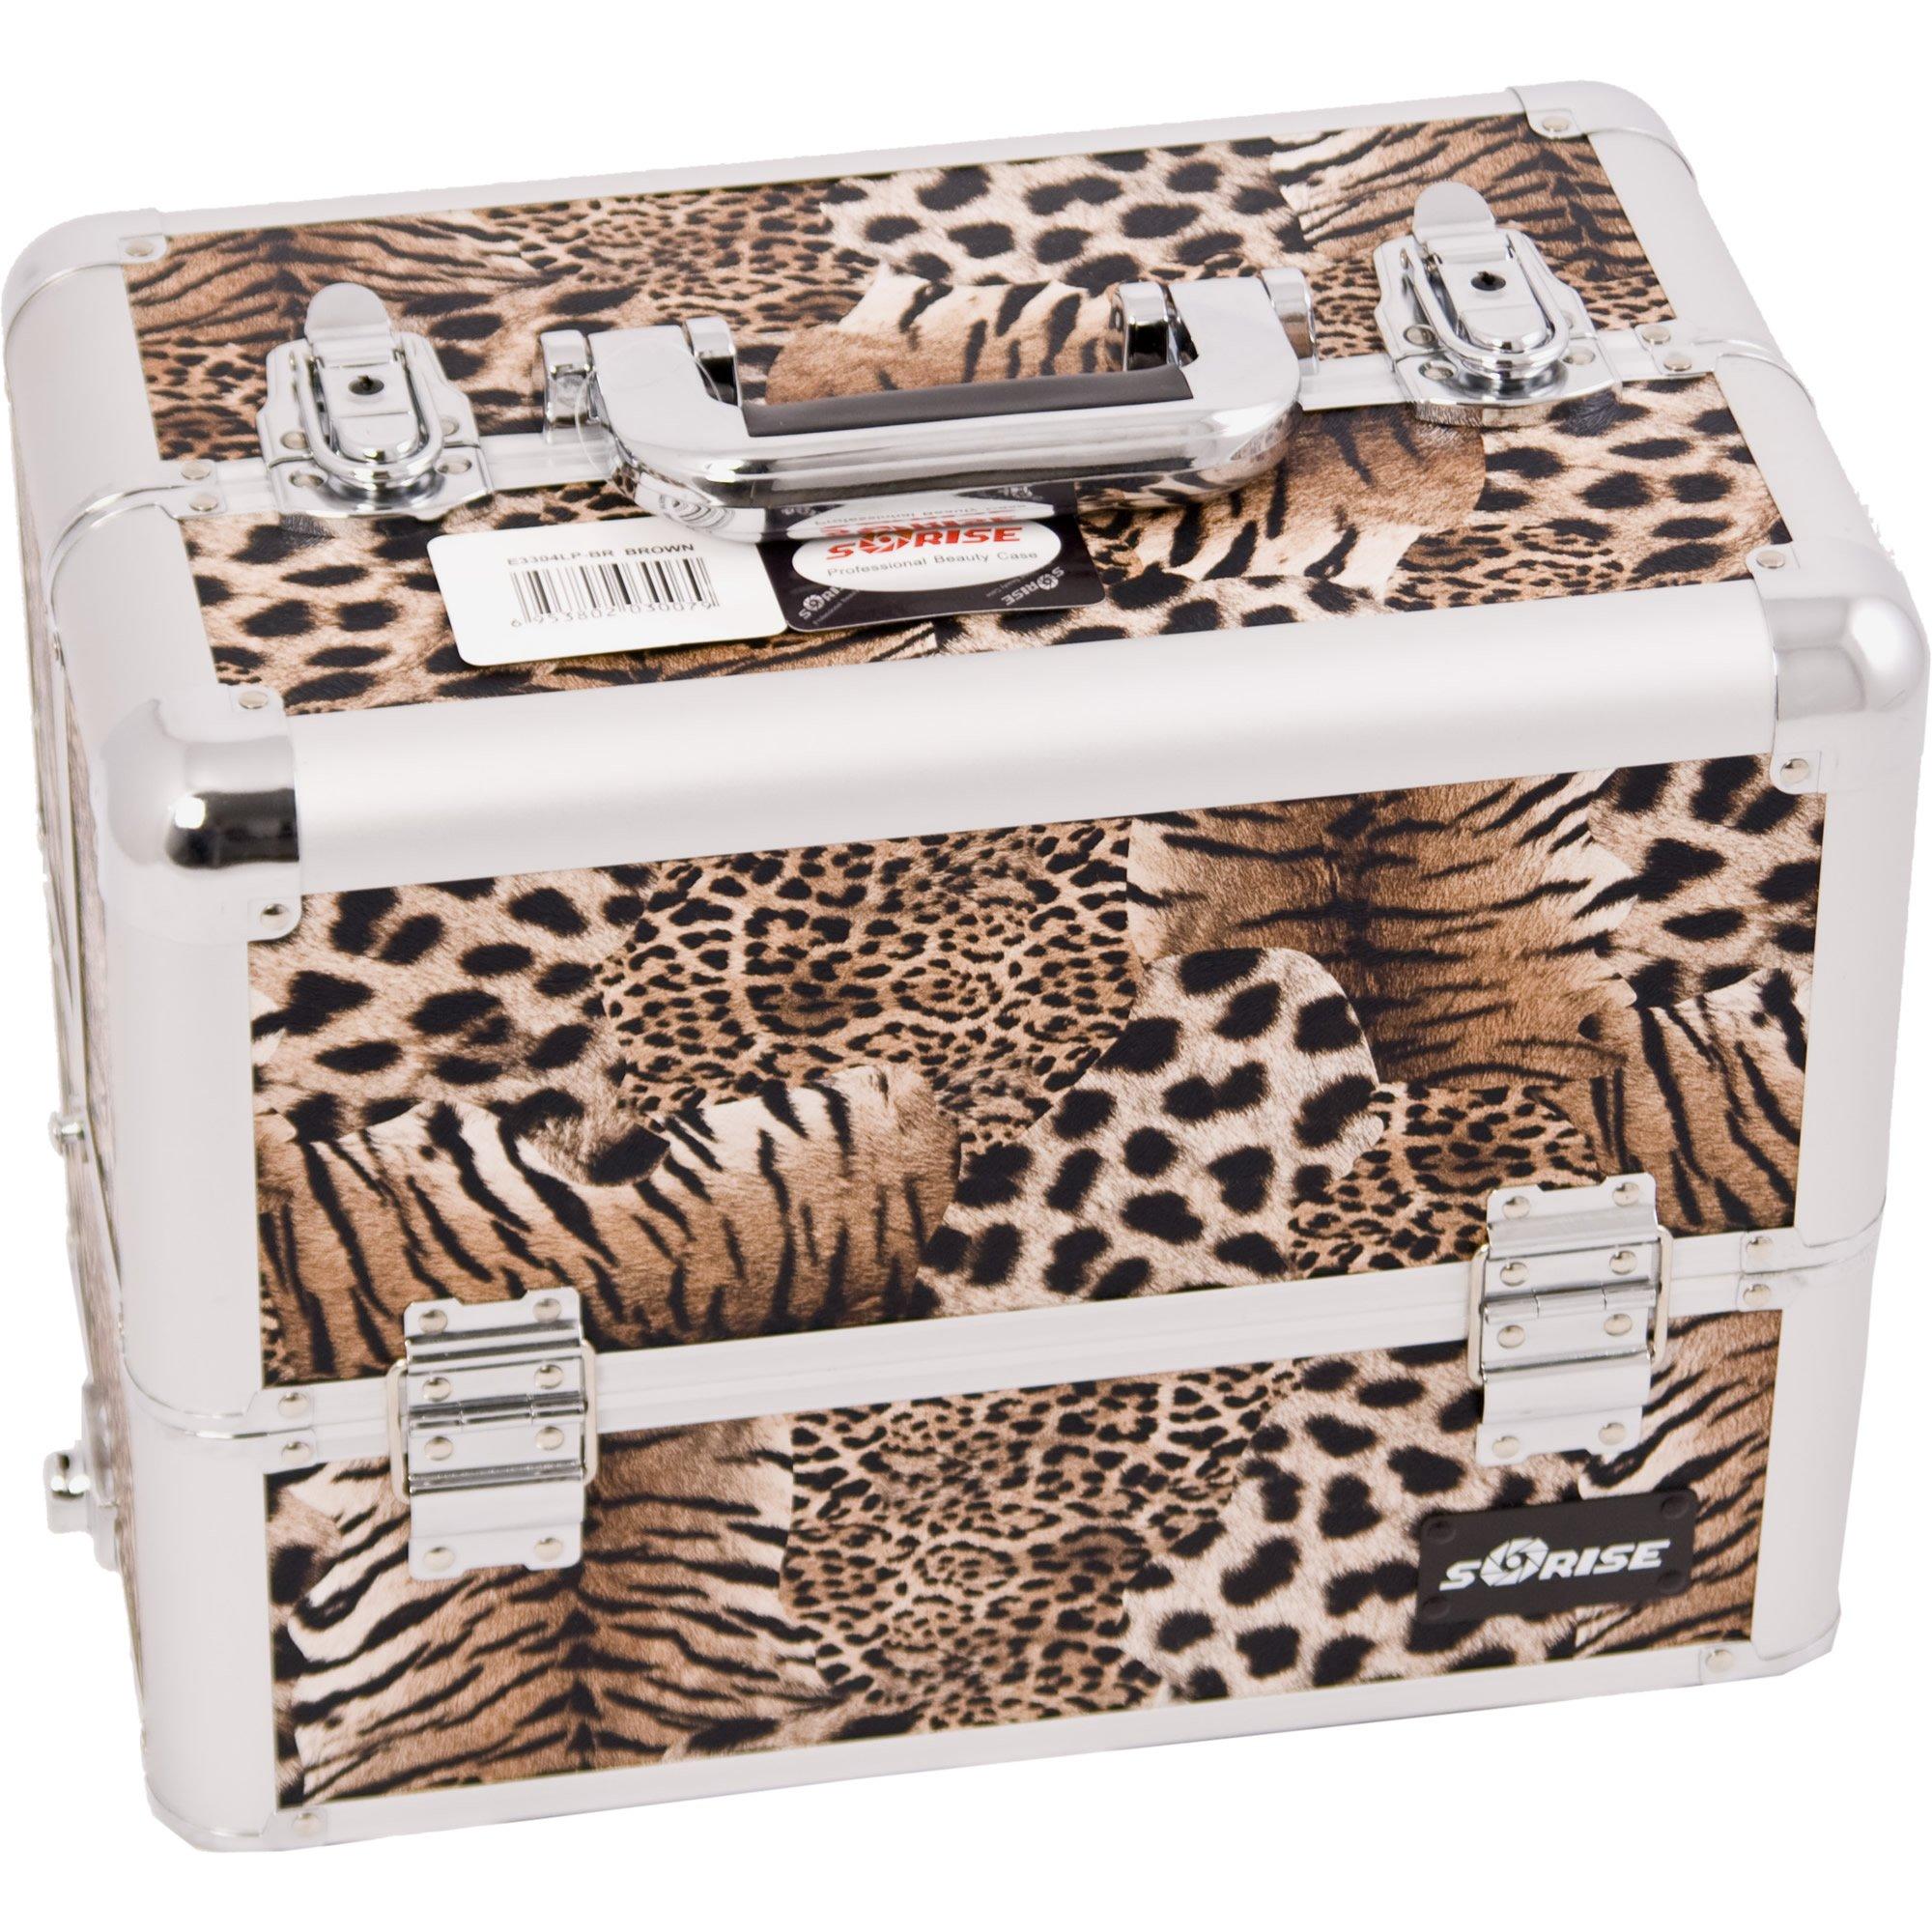 Sunrise Dona Heavy Duty Makeup Case Professional Nail Travel Organizer Box, Leopard, 9 Pound by SunRise